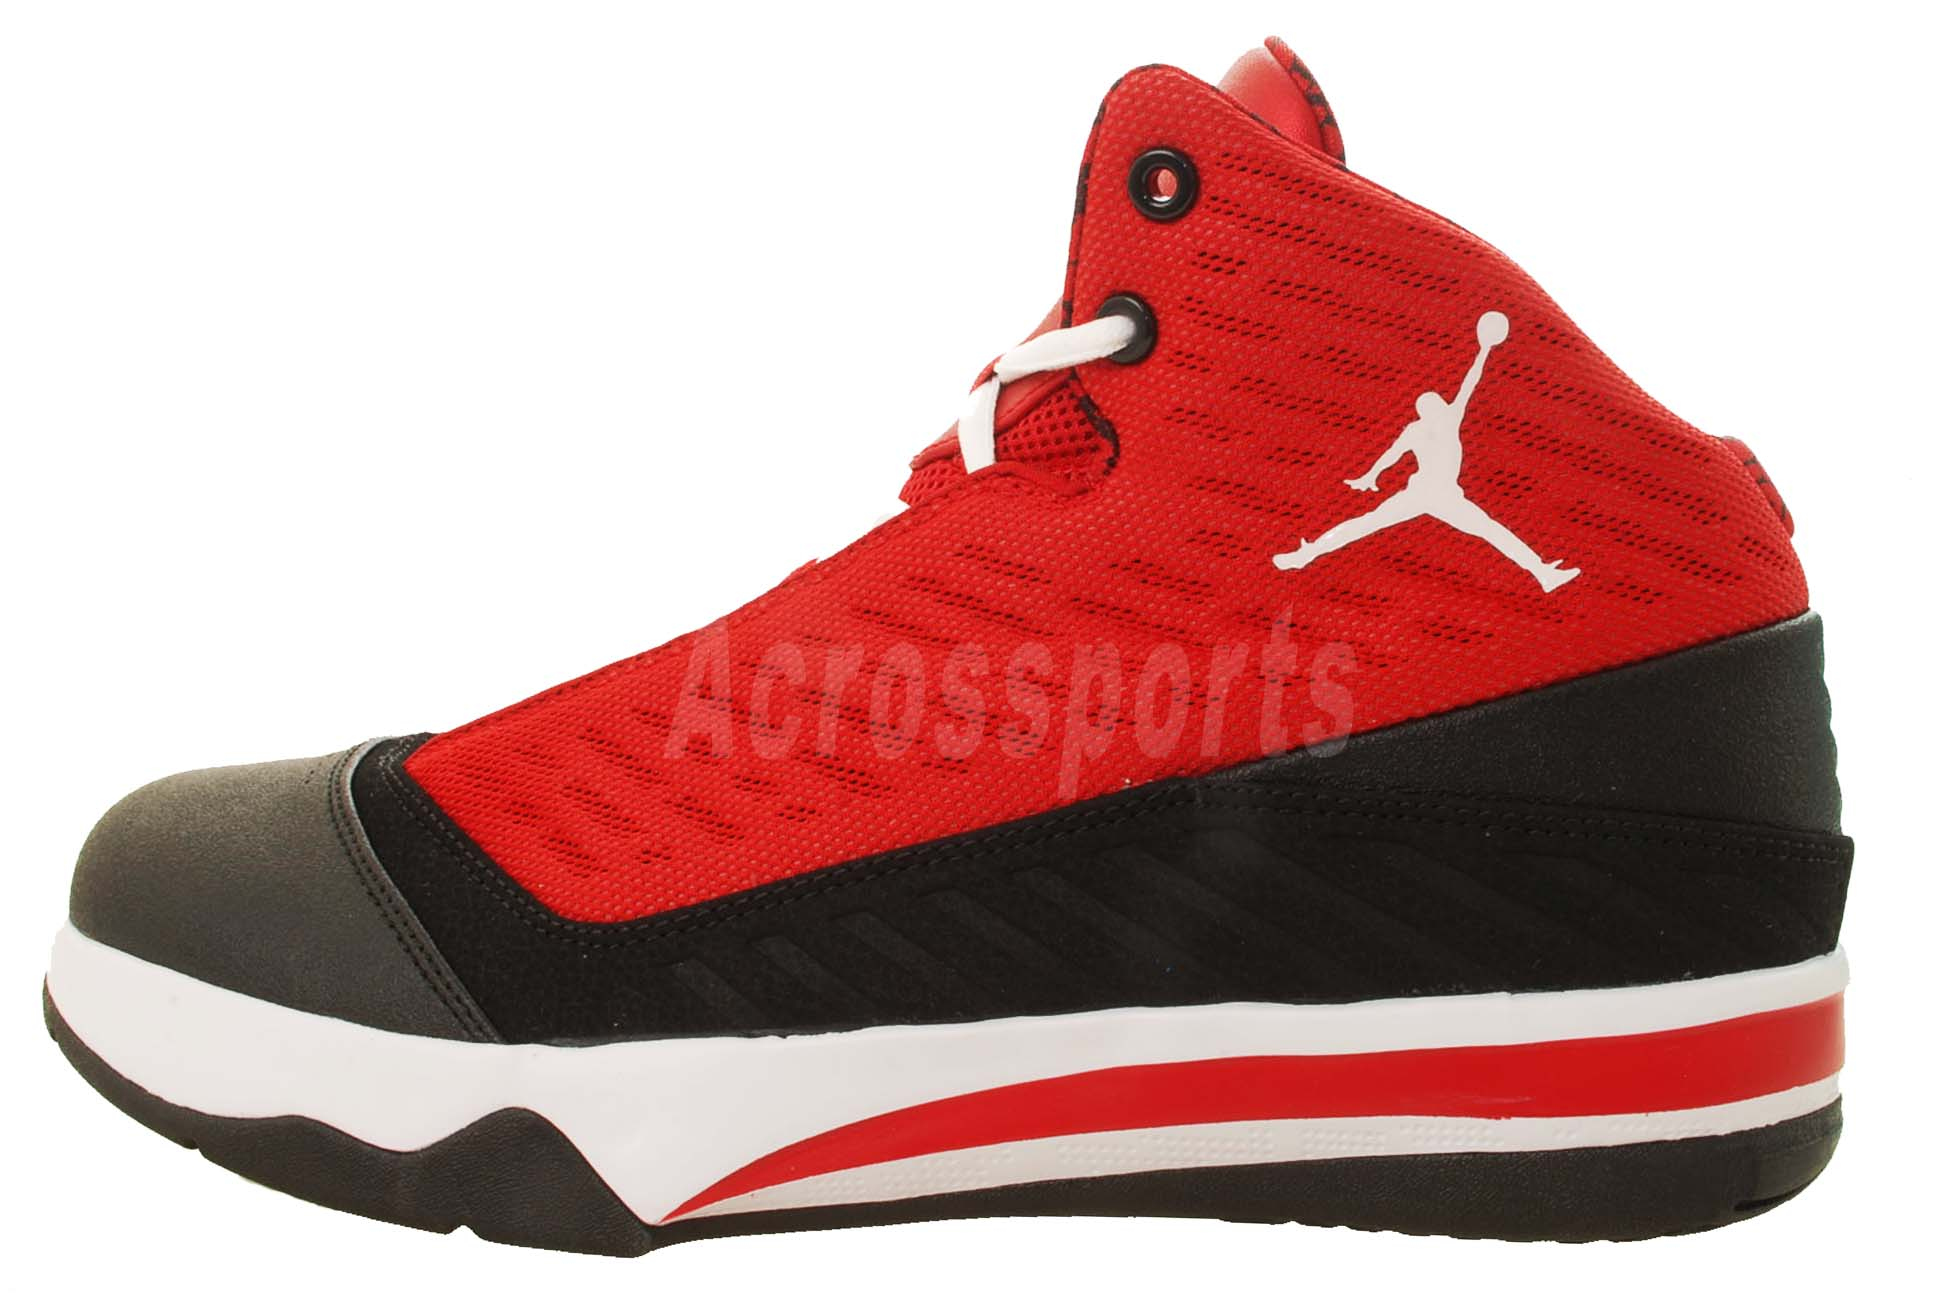 Nike Jordan B MO X Melo Carmelo Anthony Basketball Shoes ...